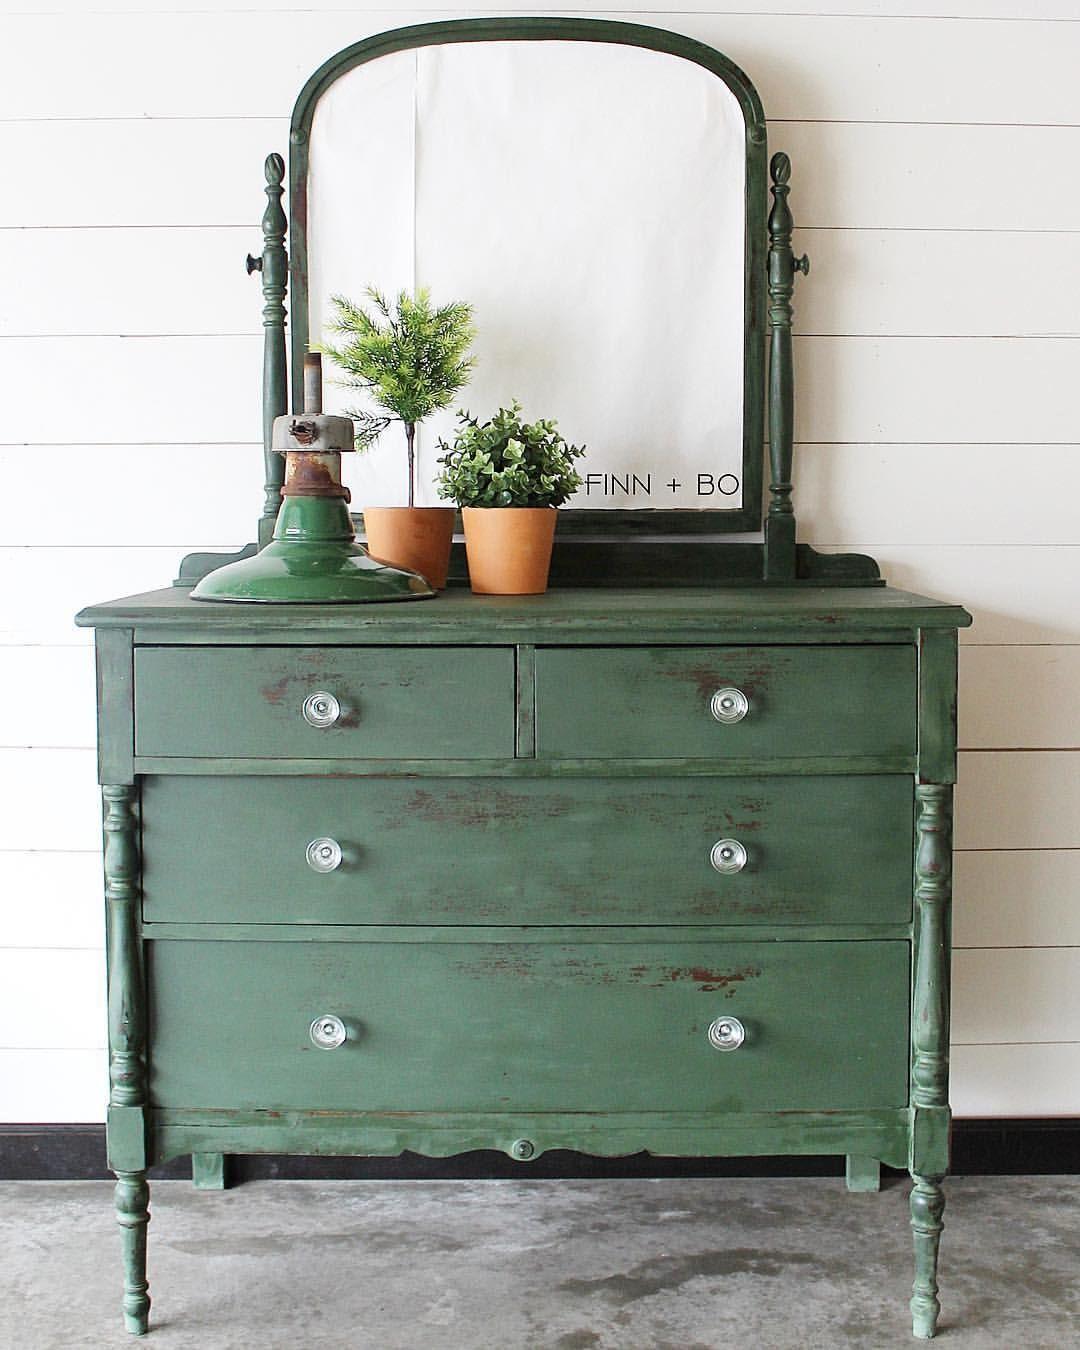 Finn And Bo Old Barn Milk Paint In Moss Green Dresser Green Dresser Green Painted Furniture Rustic Furniture [ 1350 x 1080 Pixel ]